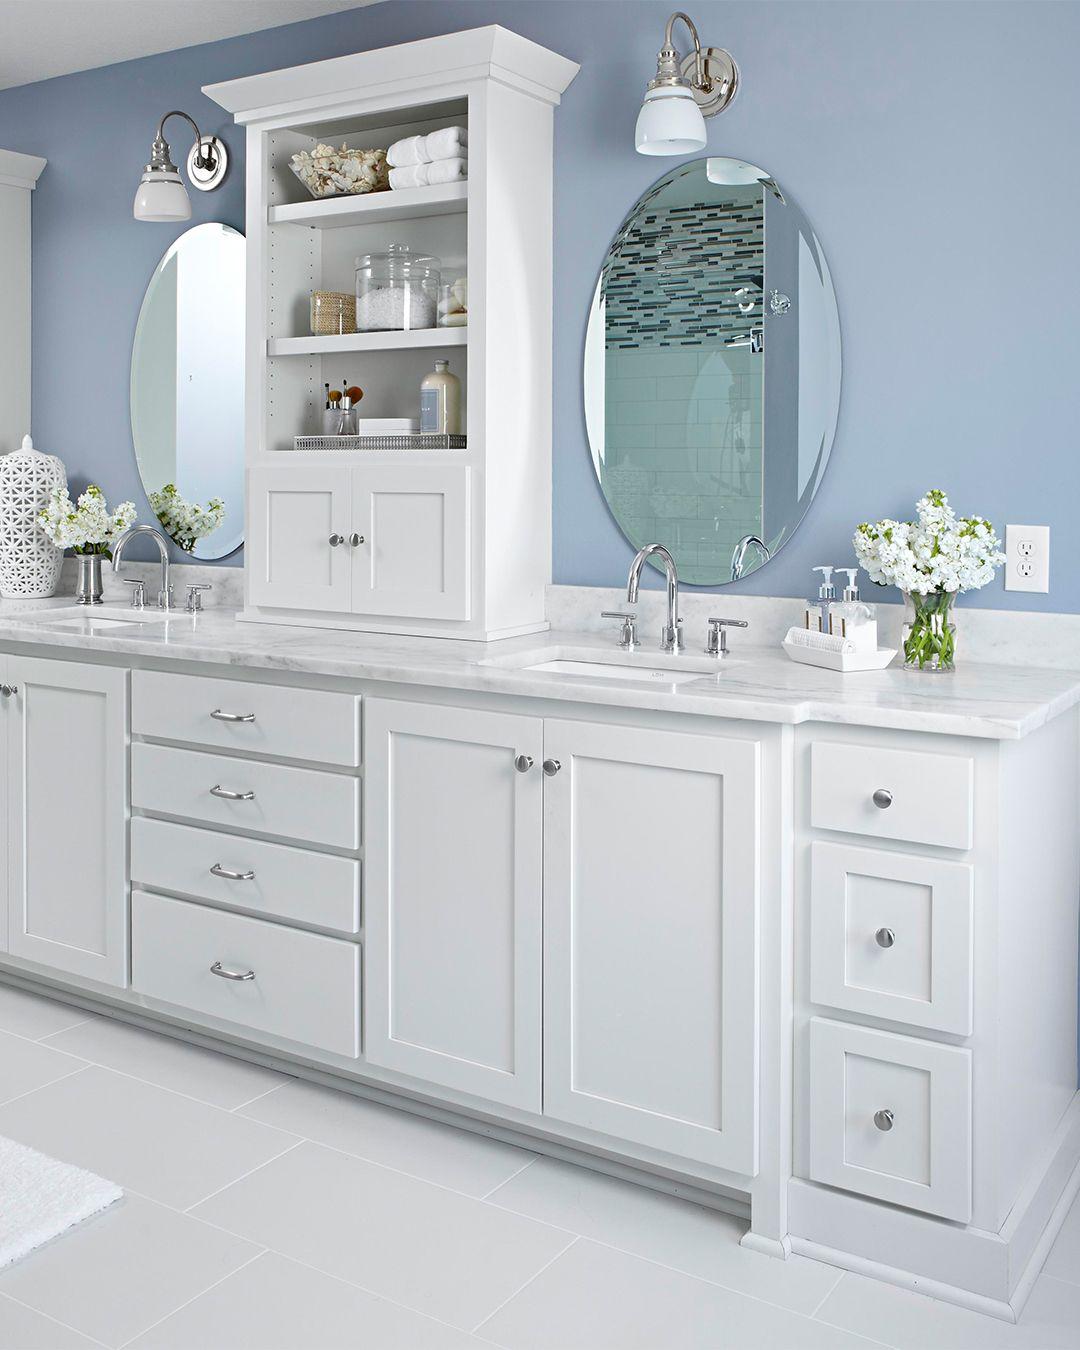 12 Popular Bathroom Paint Colors Our Editors Swear By Best Bathroom Paint Colors Blue Bathroom Blue Bathroom Paint